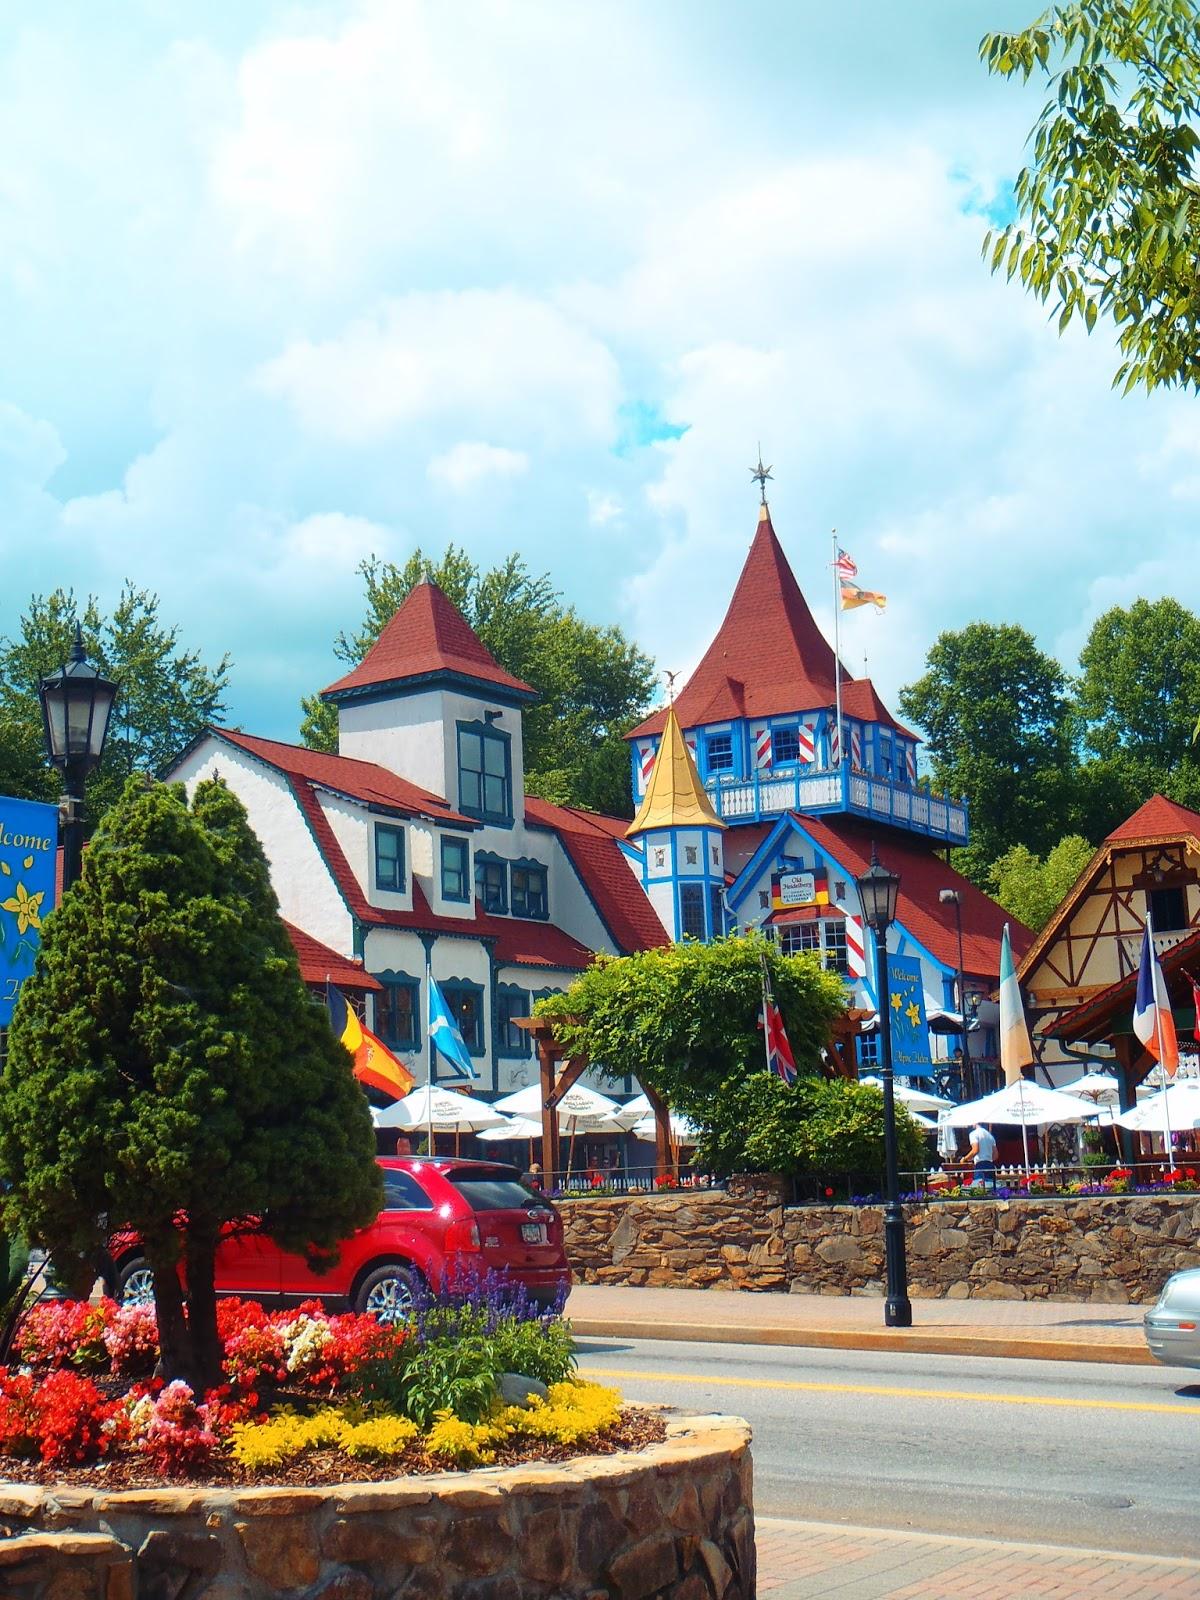 Adventures in the German themed village of Helen, Georgia